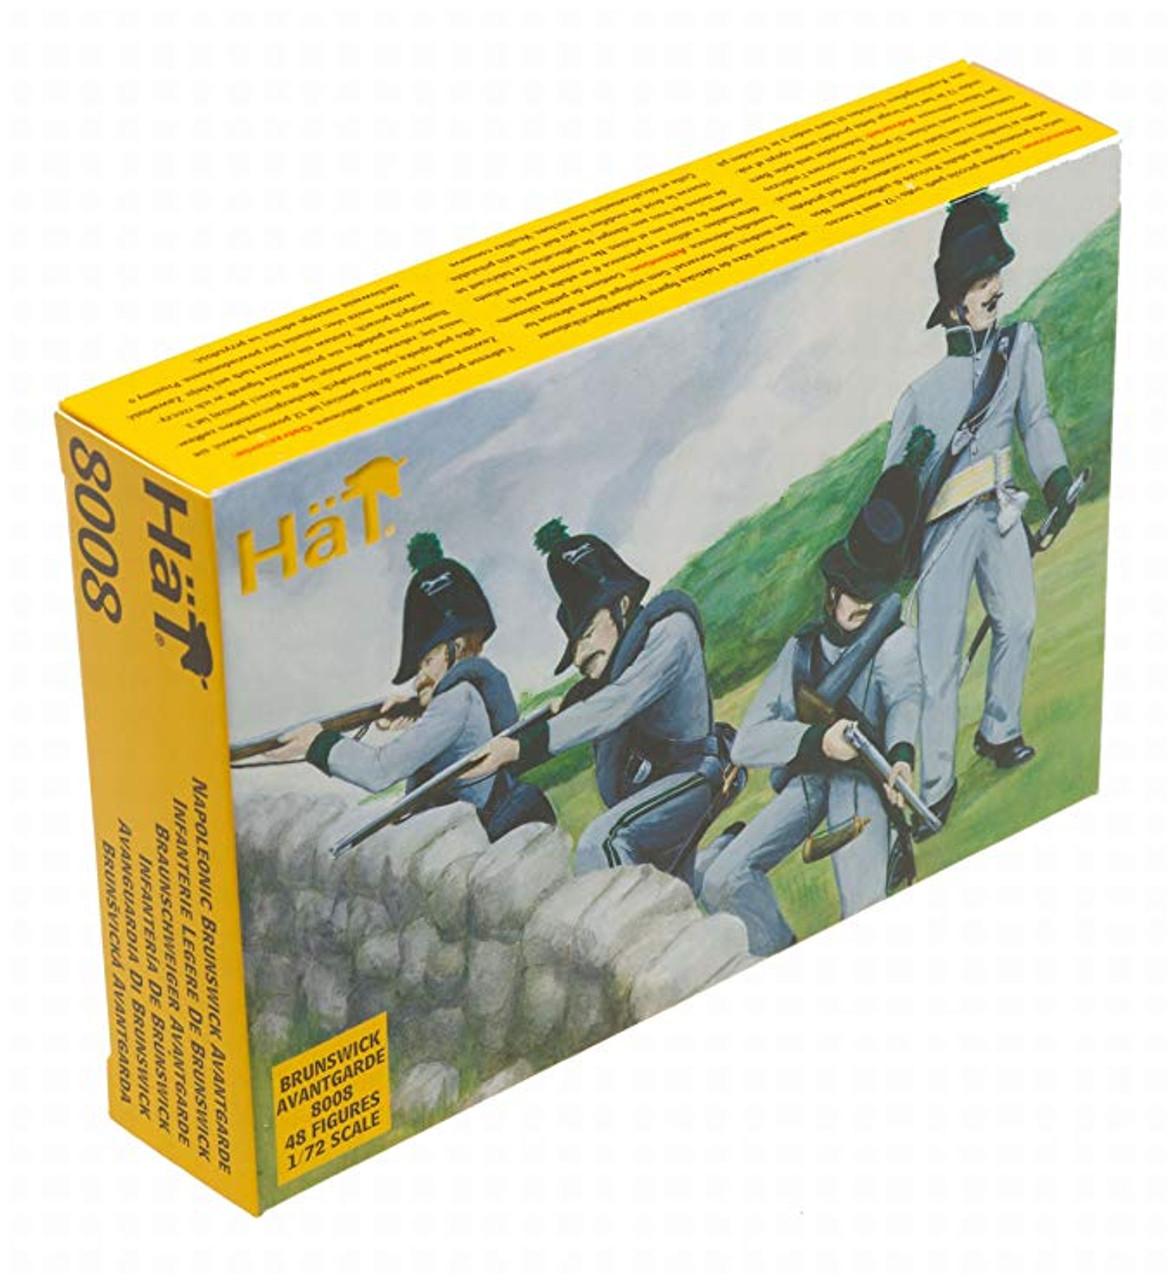 HaT 8008 Napoleonic Brunswick Avante Garde Figures 1:72 Scale